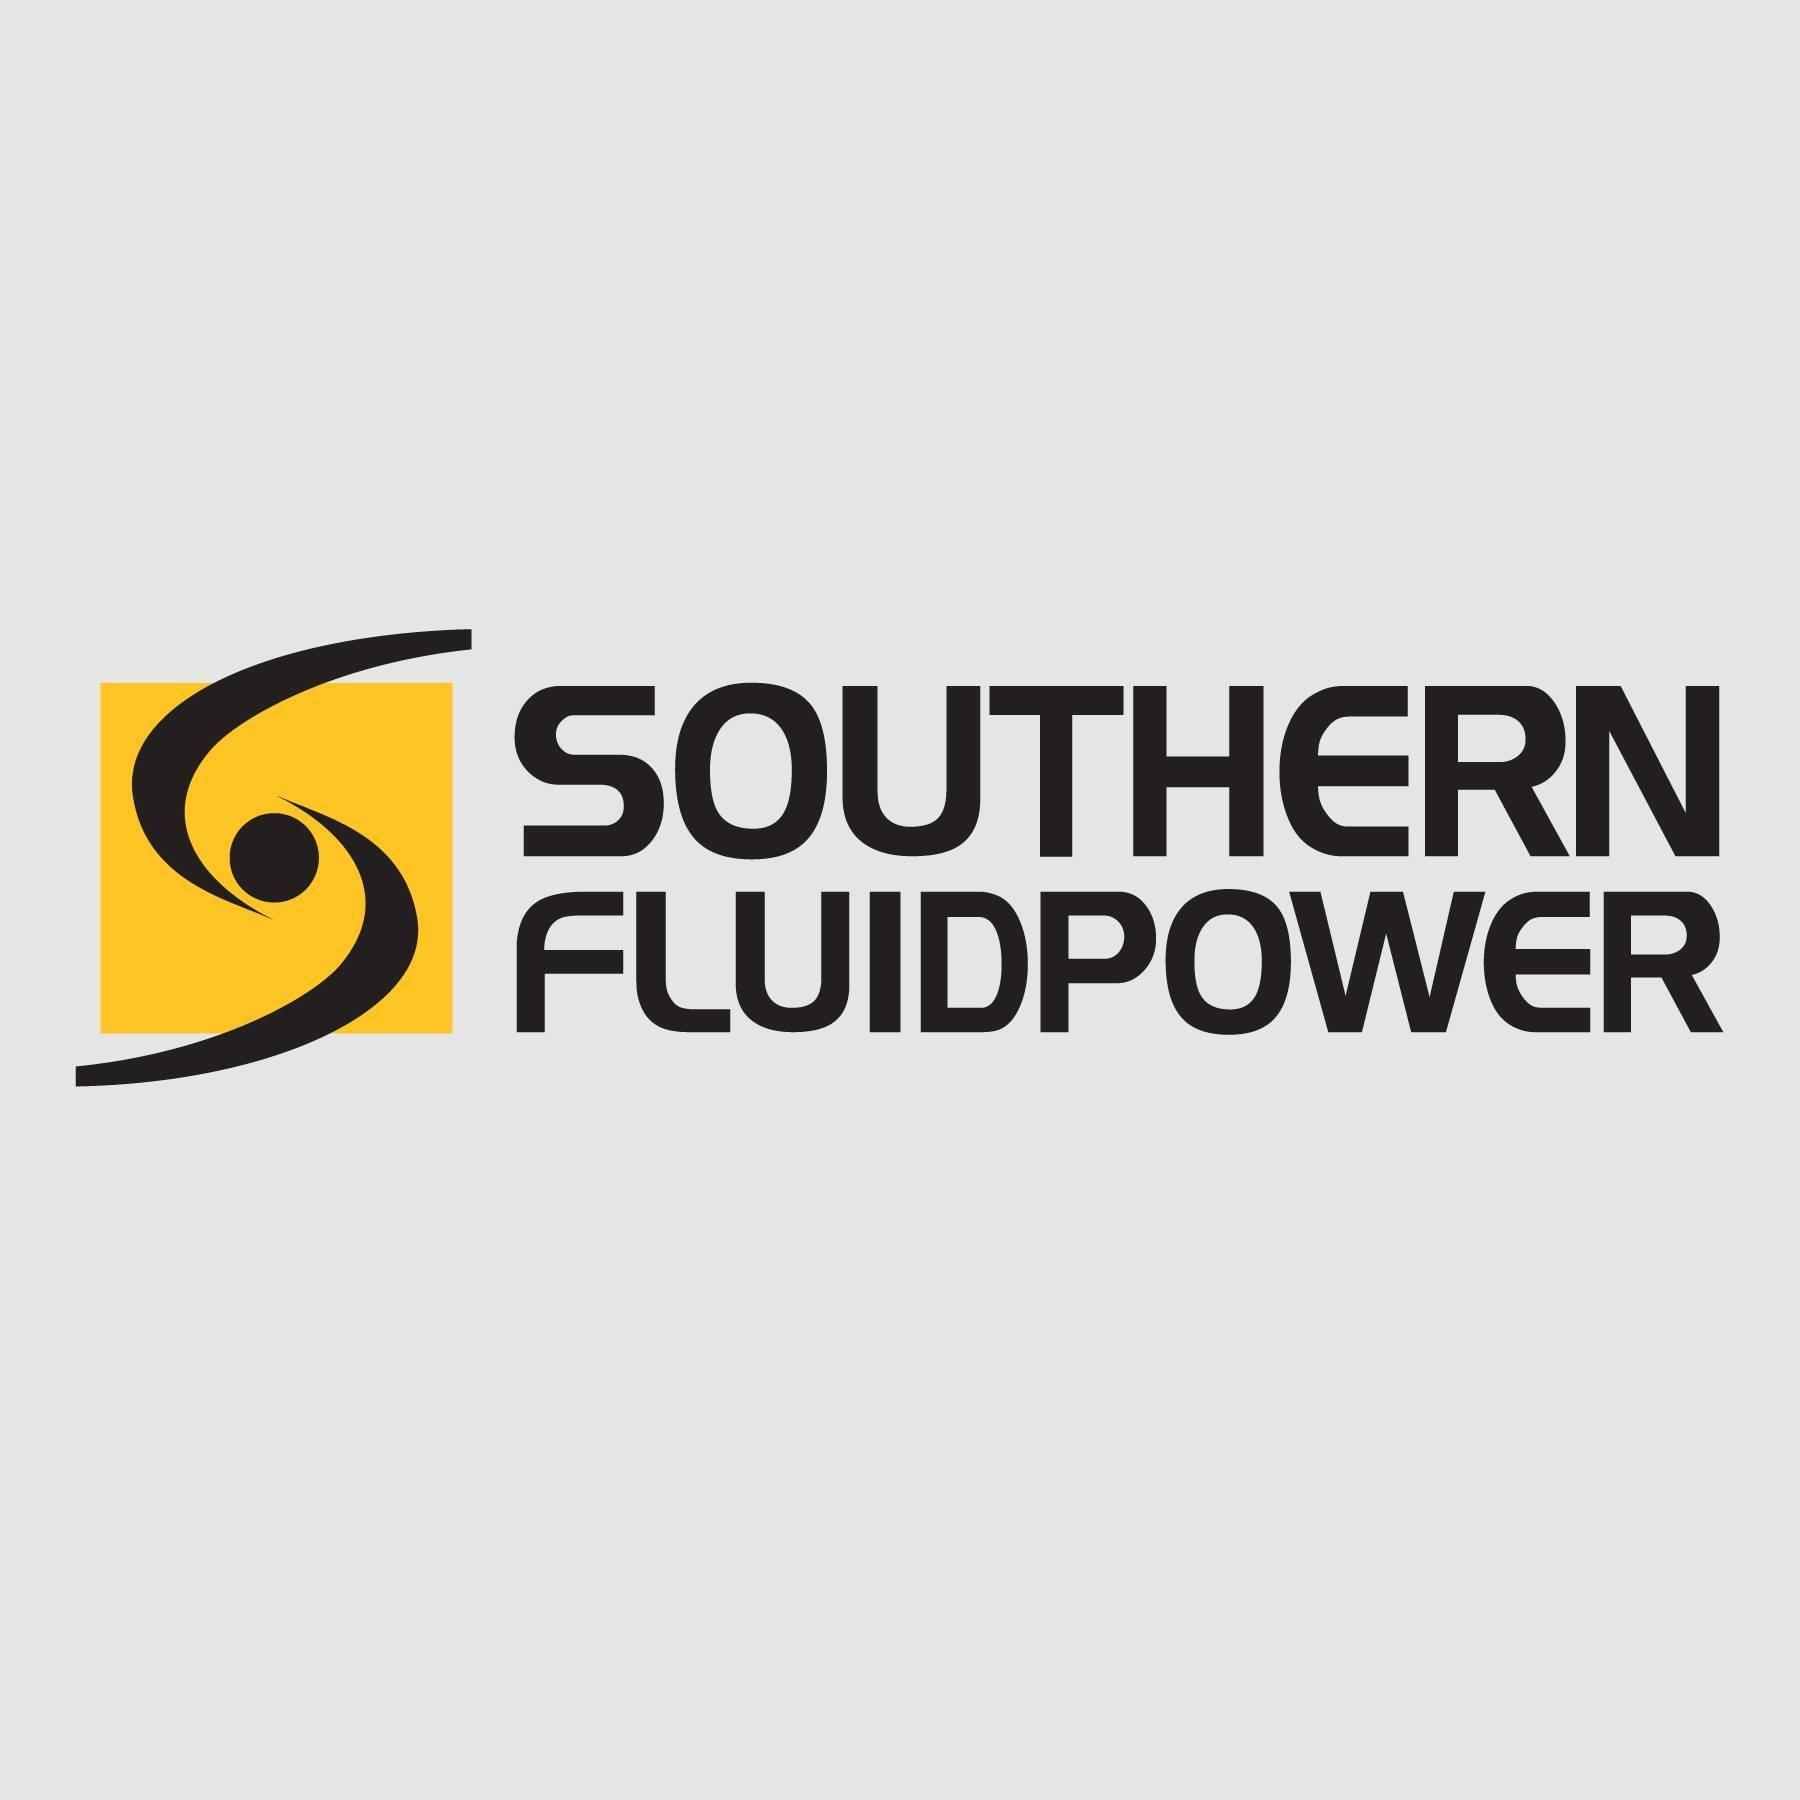 Southern Fluid Power.jpg